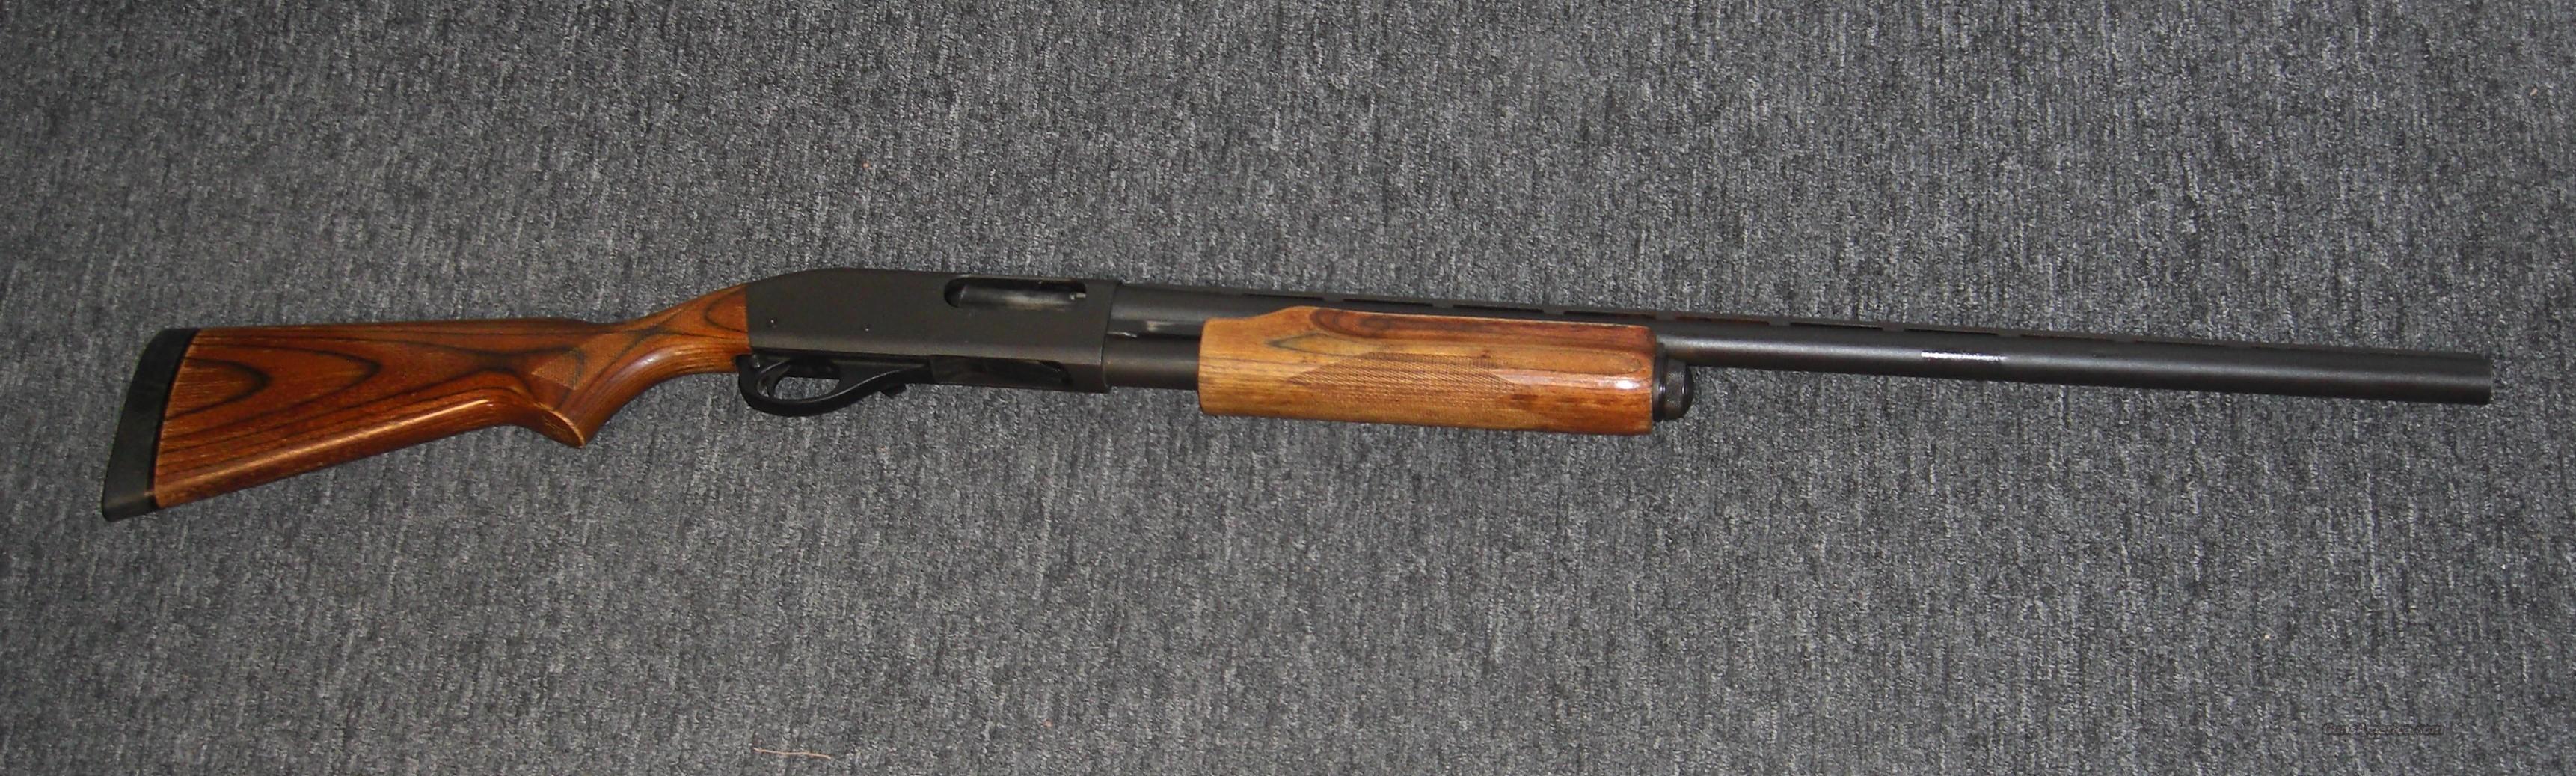 870 Express Magnum  Guns > Shotguns > Remington Shotguns  > Pump > Hunting